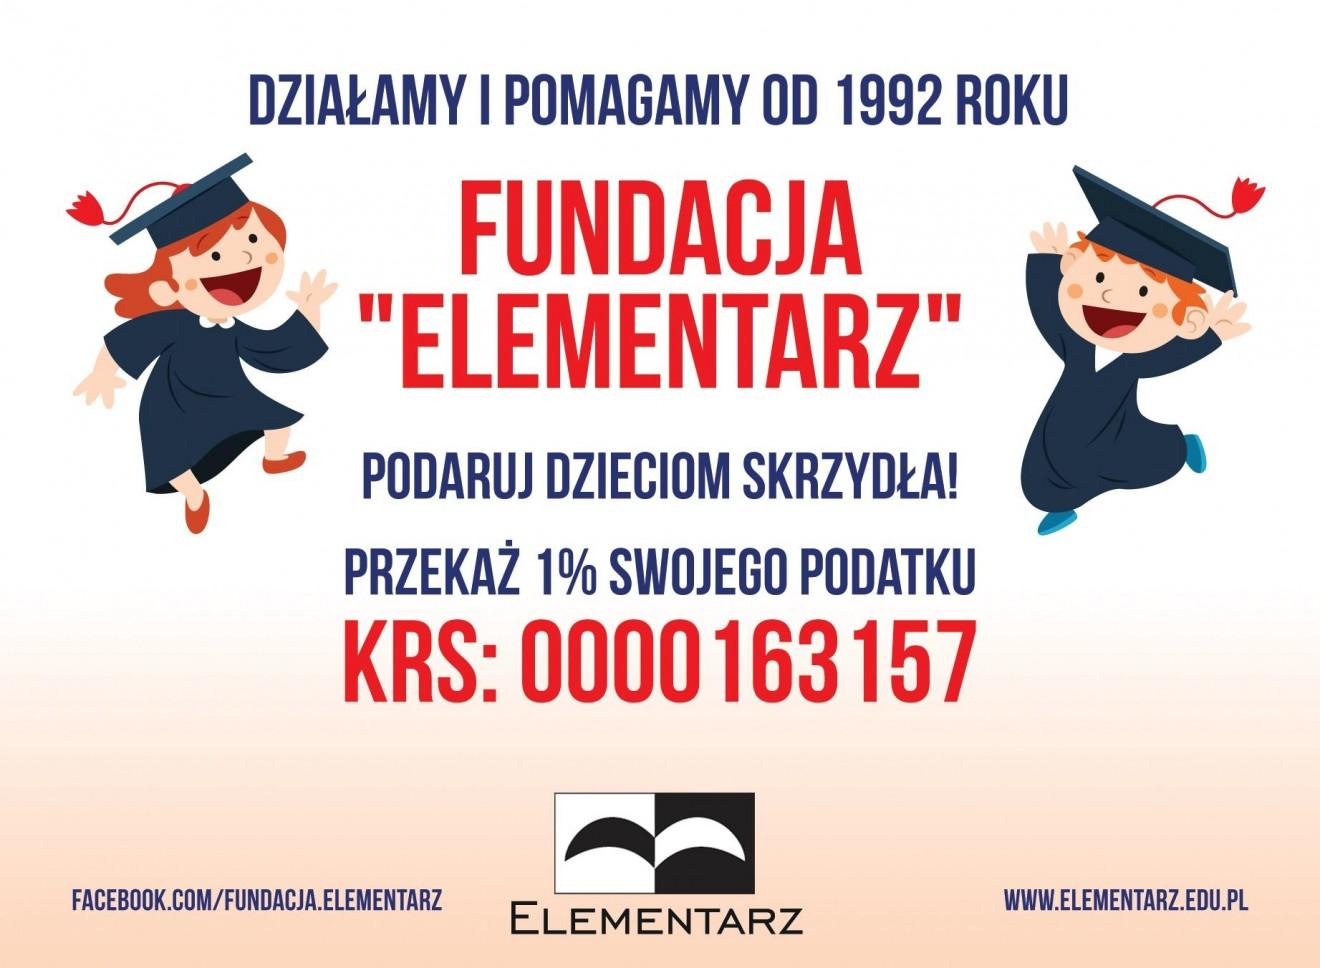 ulotka_elementarz00_page_001